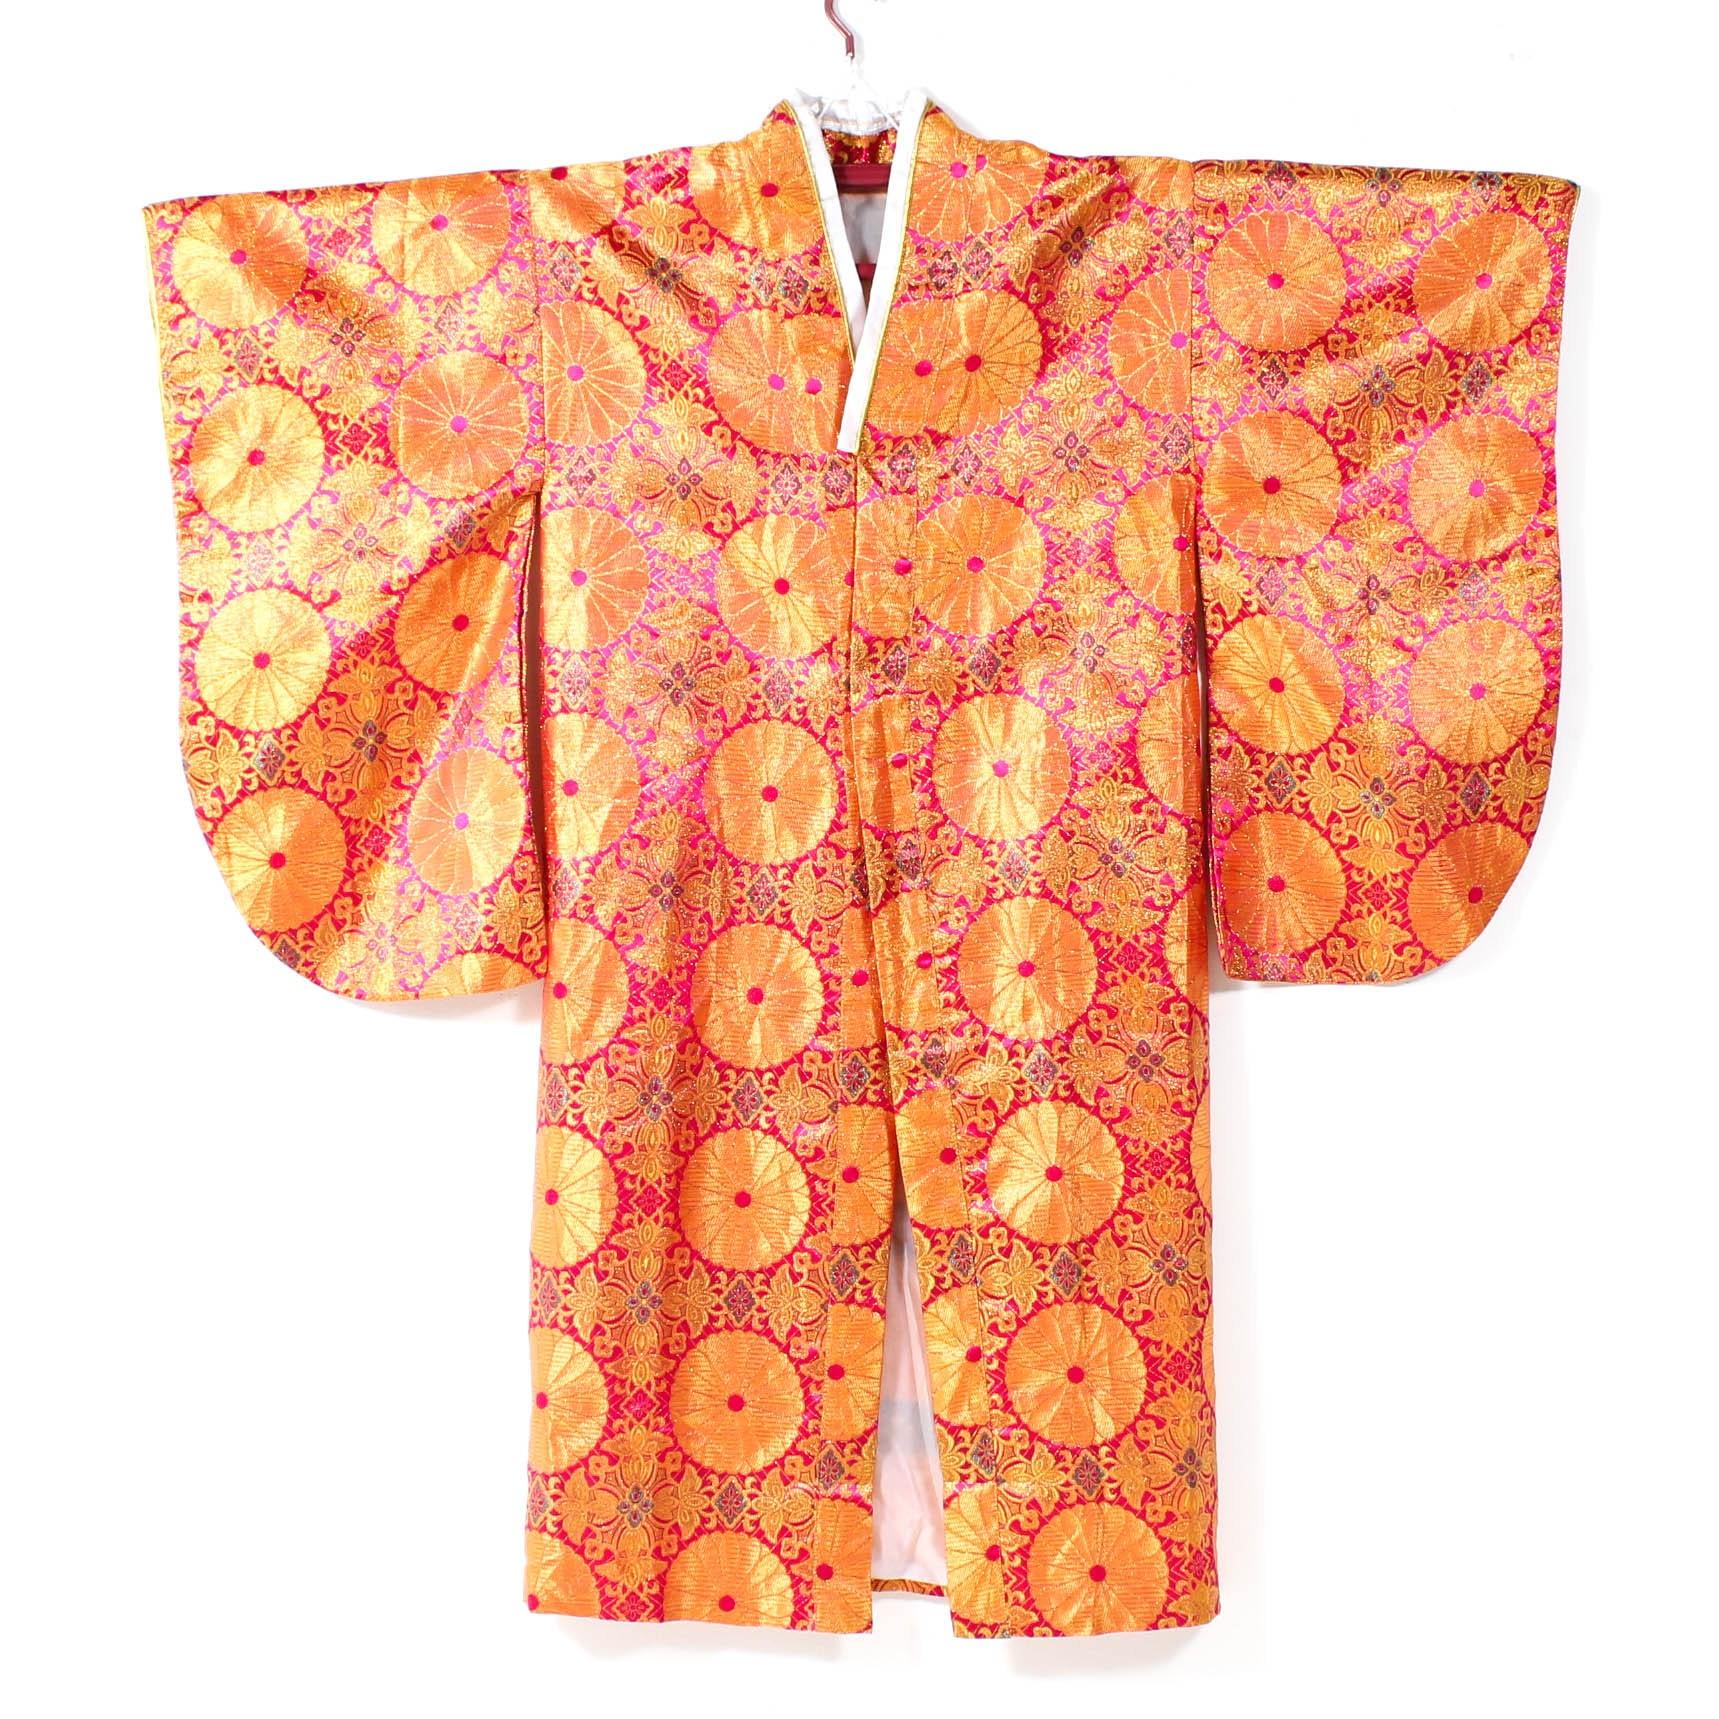 Vintage Brocade Kofurisode Kimono with Chrysanthemum Motif